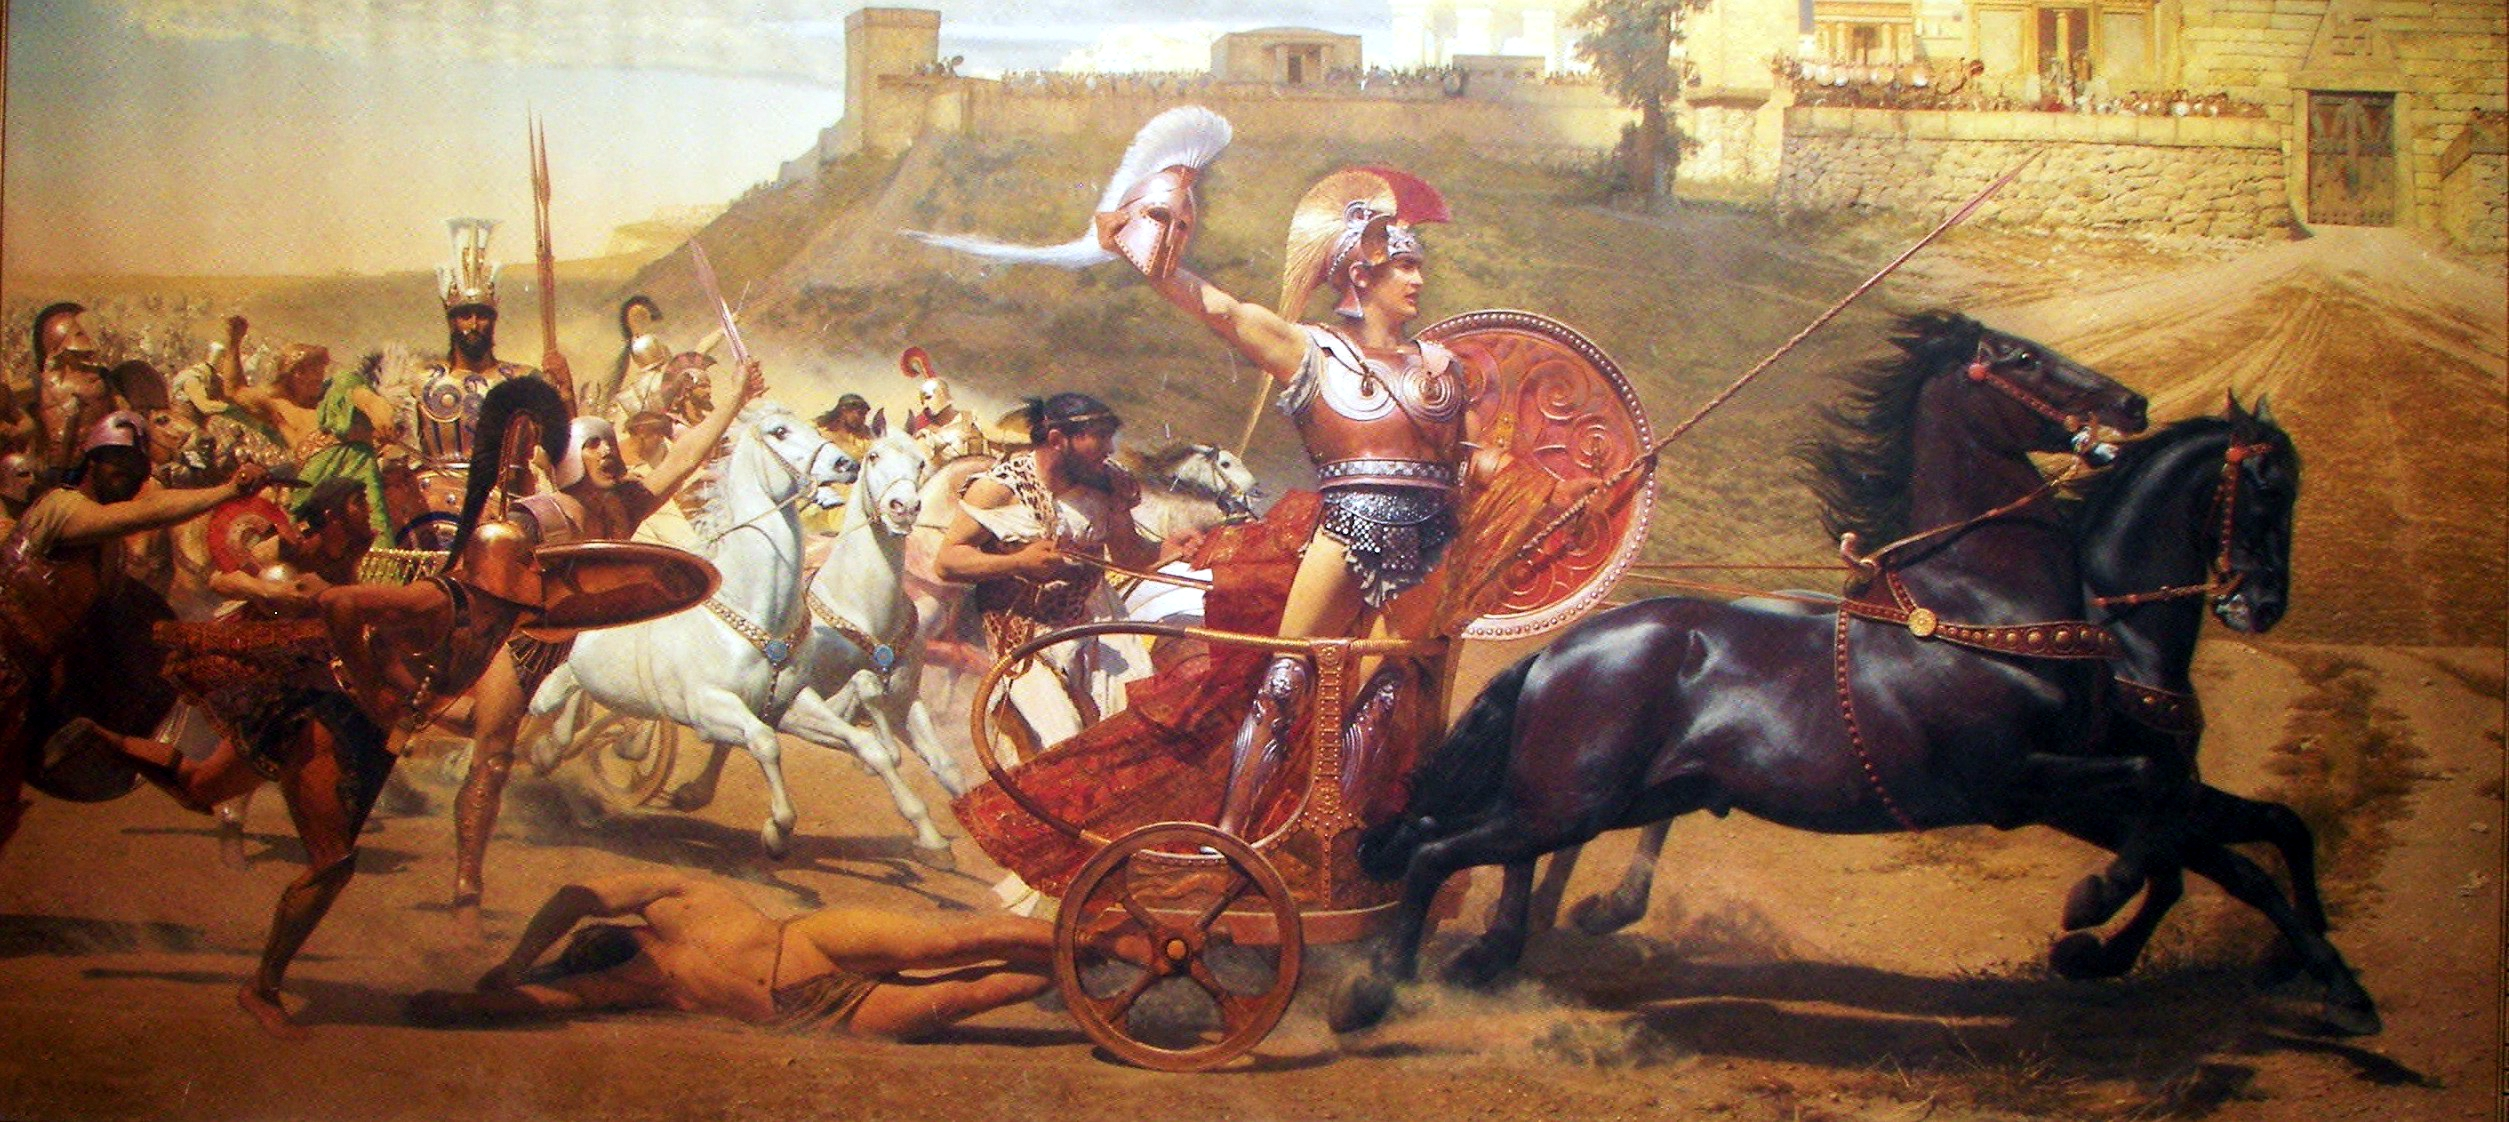 http://upload.wikimedia.org/wikipedia/en/5/58/Triumph_of_Achilles_in_Corfu_Achilleion.jpg